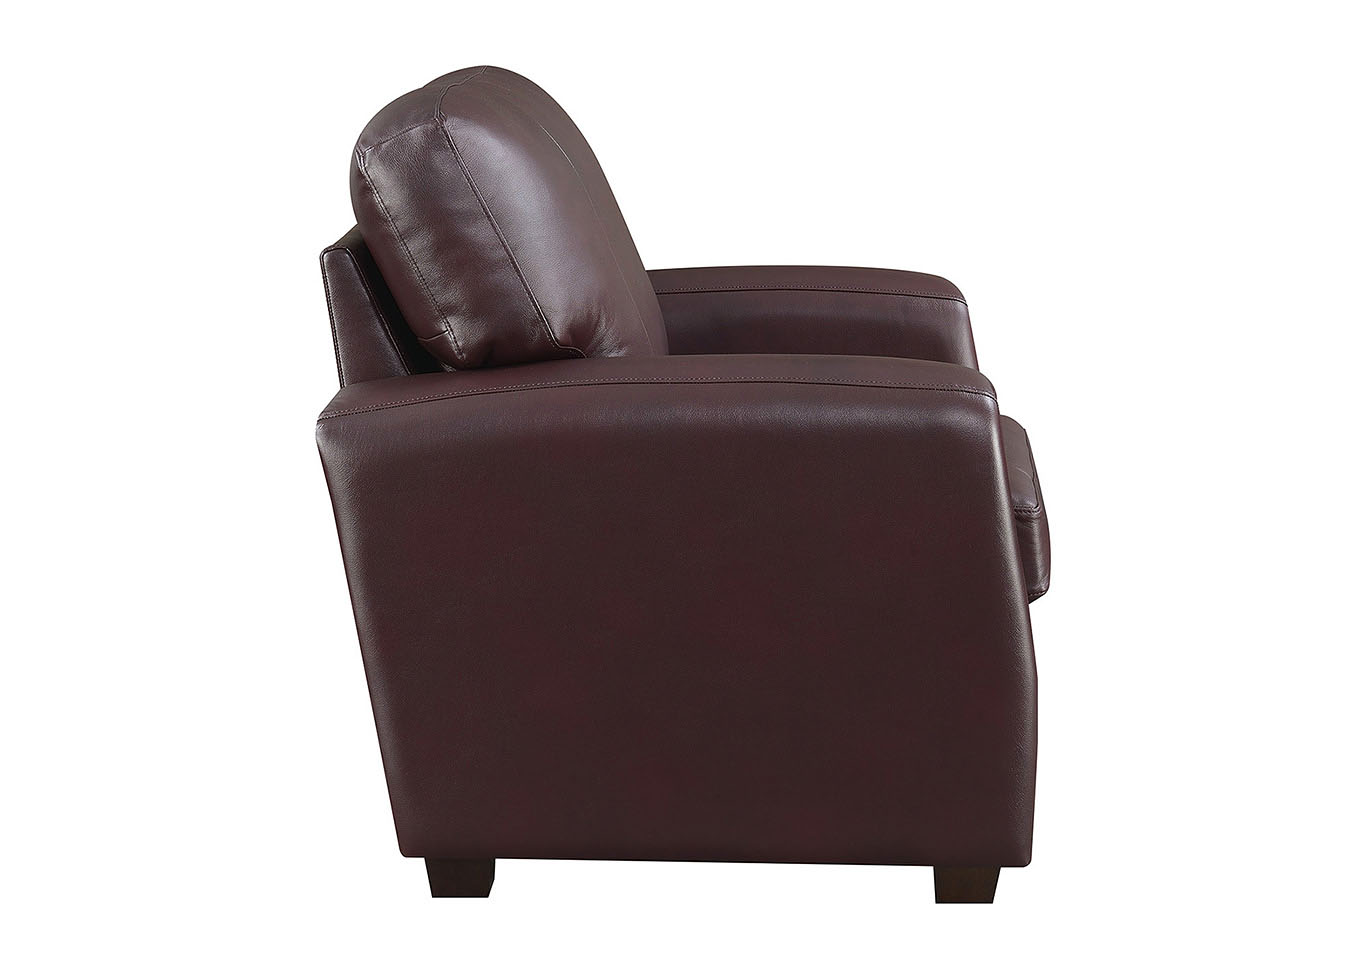 Phenomenal Best Buy Furniture And Mattress Stephanie Burgundy Leather Ibusinesslaw Wood Chair Design Ideas Ibusinesslaworg